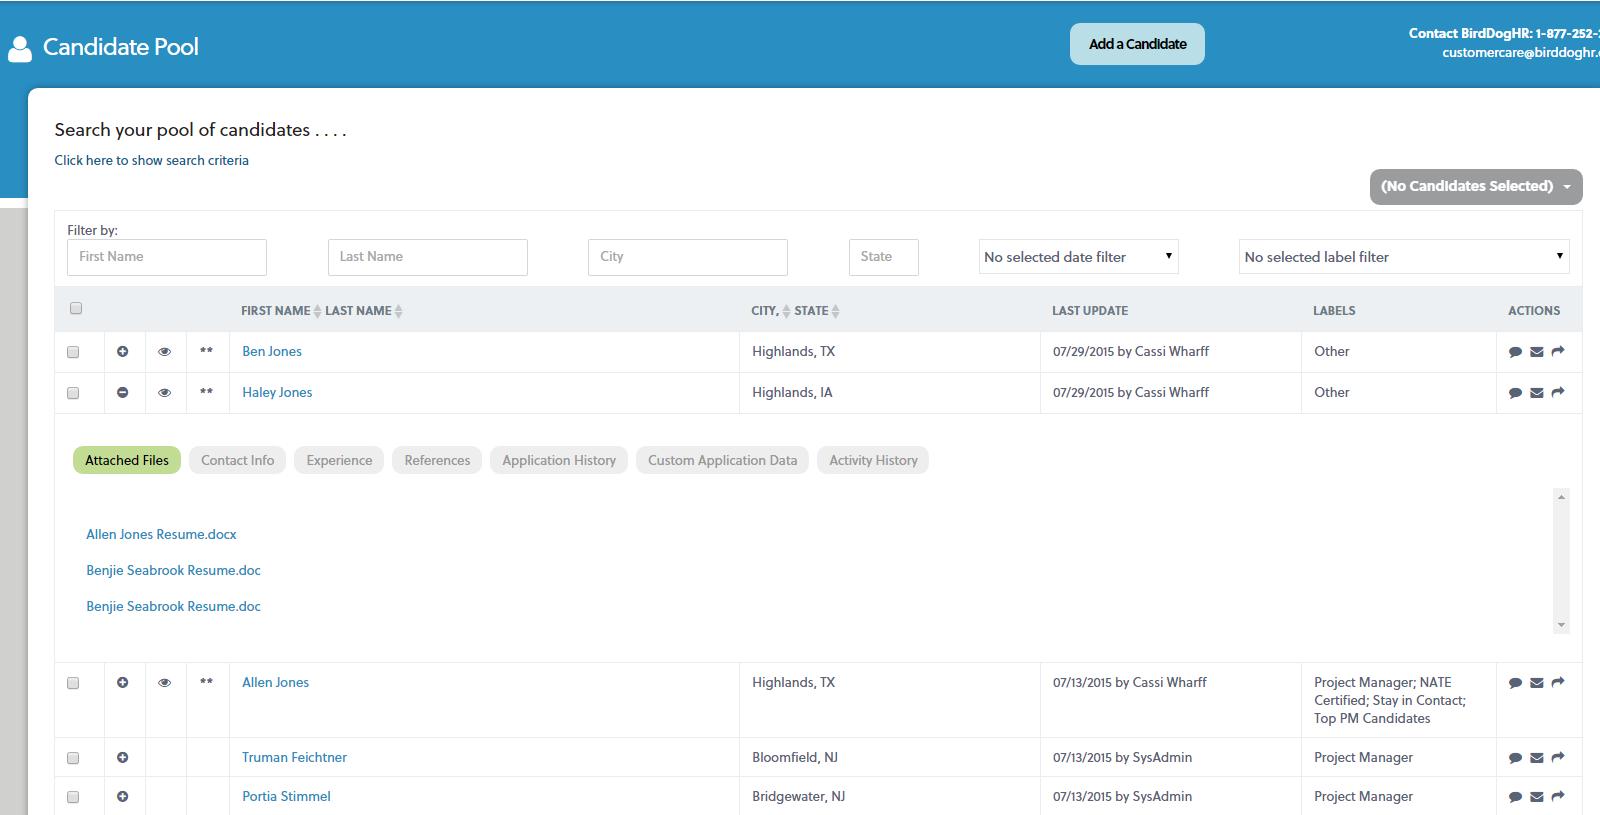 BirdDogHR Demo - birdDogHR ATS Searchable Candidate Database